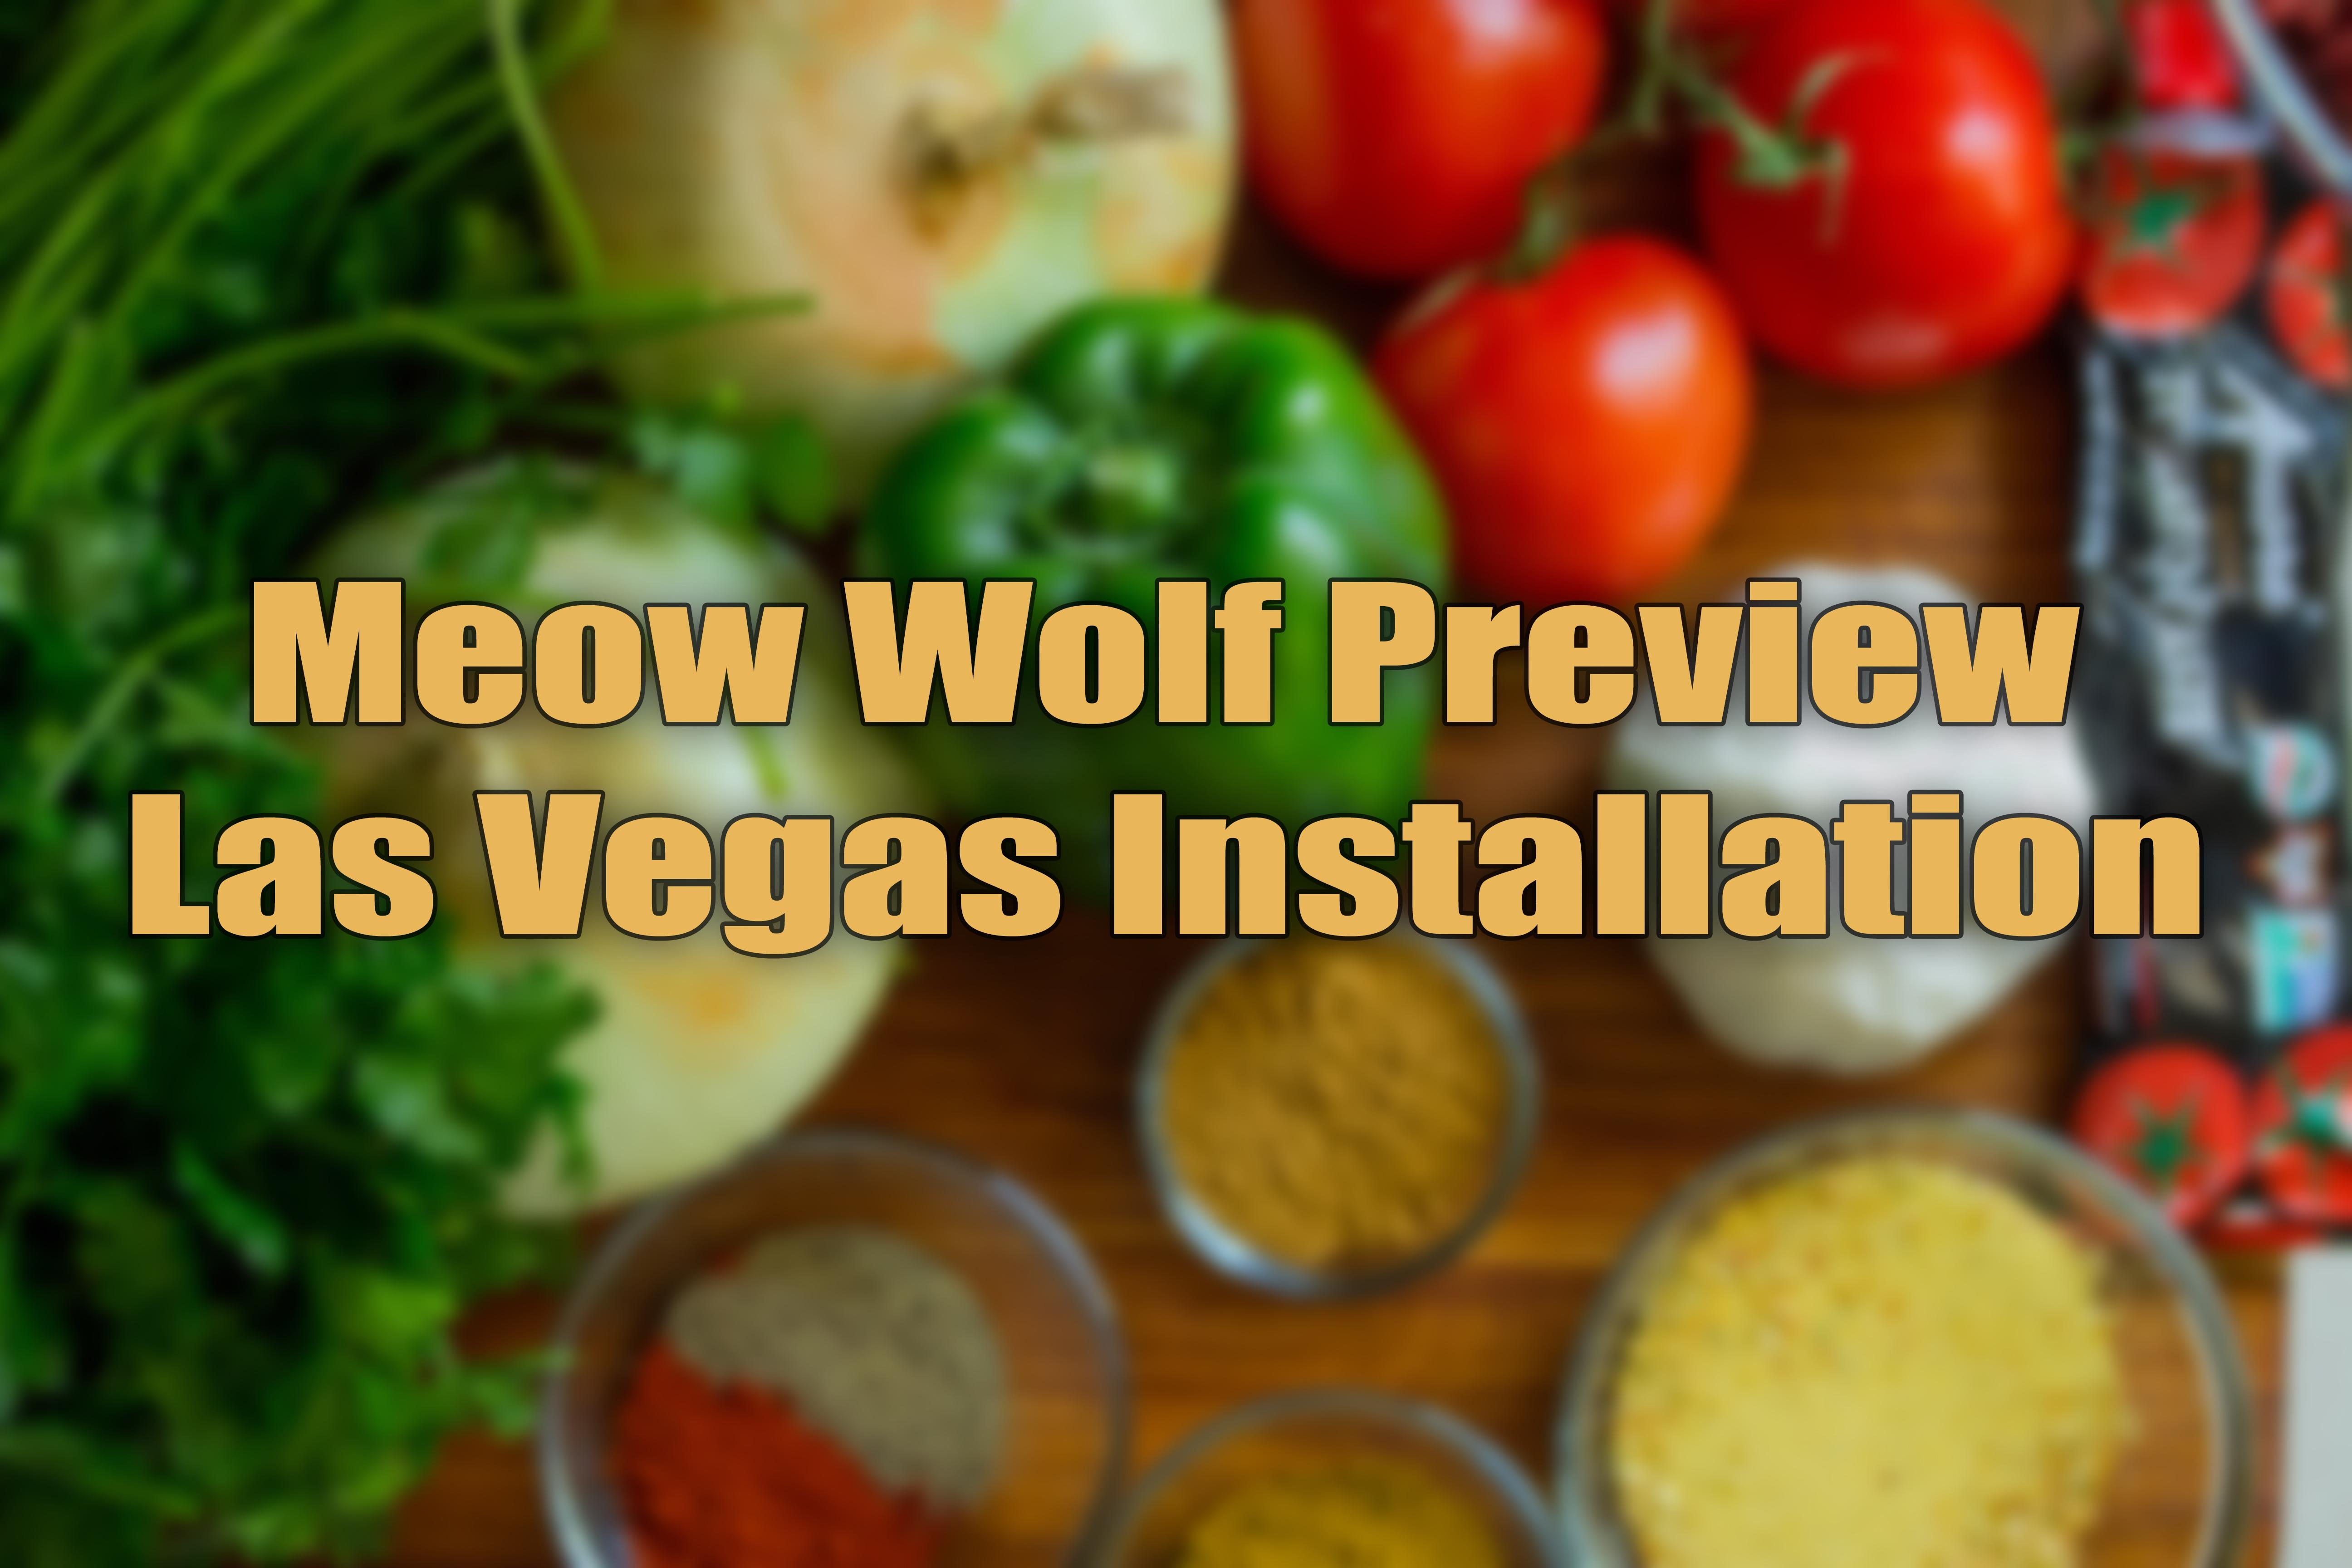 Meow Wolf in Las Vegas.jpg